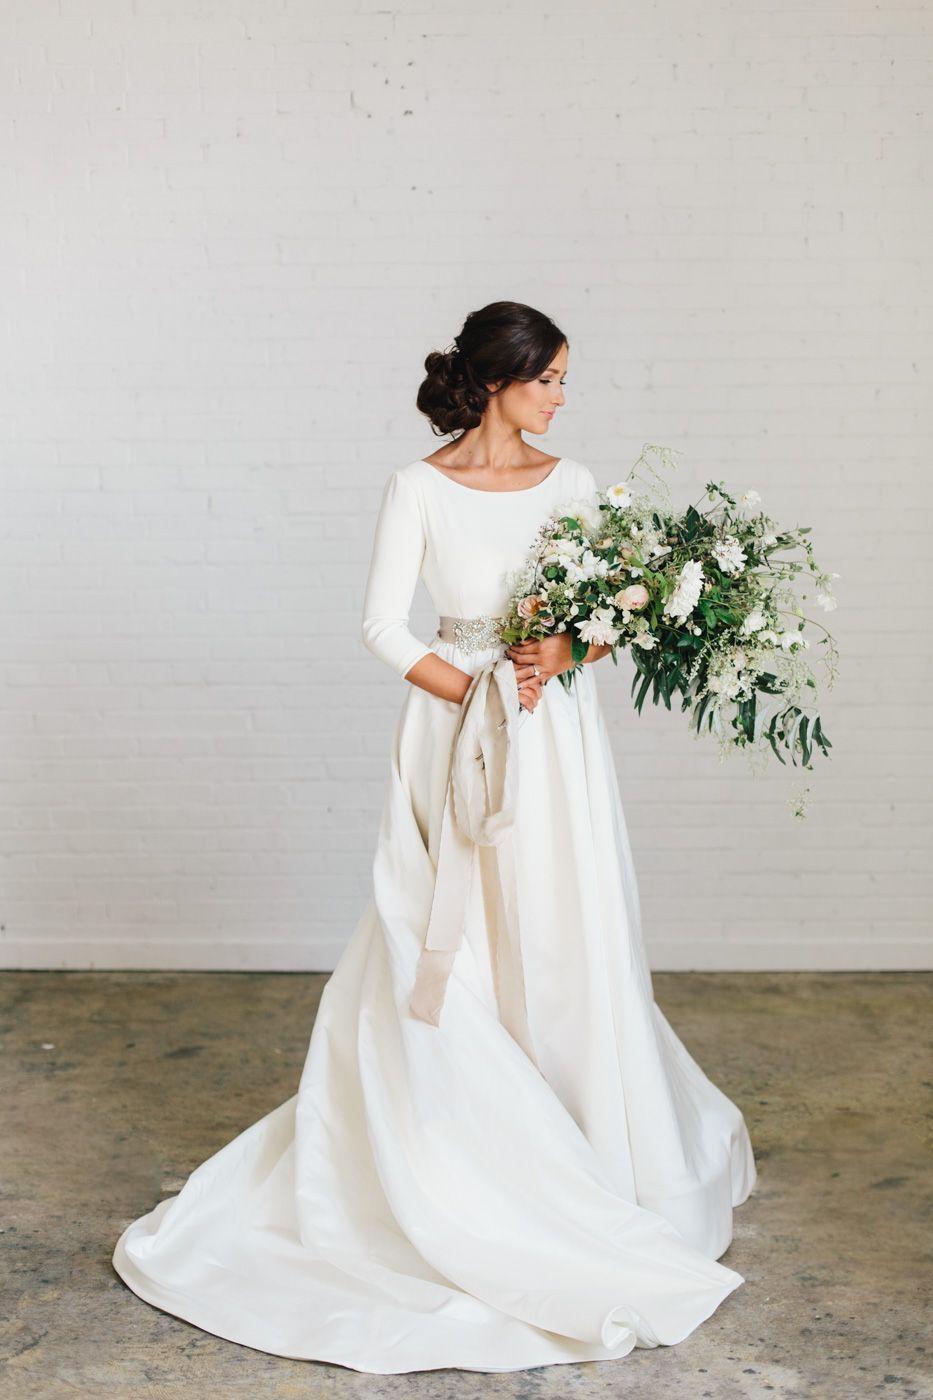 50 Amazing White Wedding Dresses For Beautiful Bride Ideas Winter Wedding Dress Scoop Neck Wedding Dress Italian Wedding Dresses [ 1400 x 933 Pixel ]